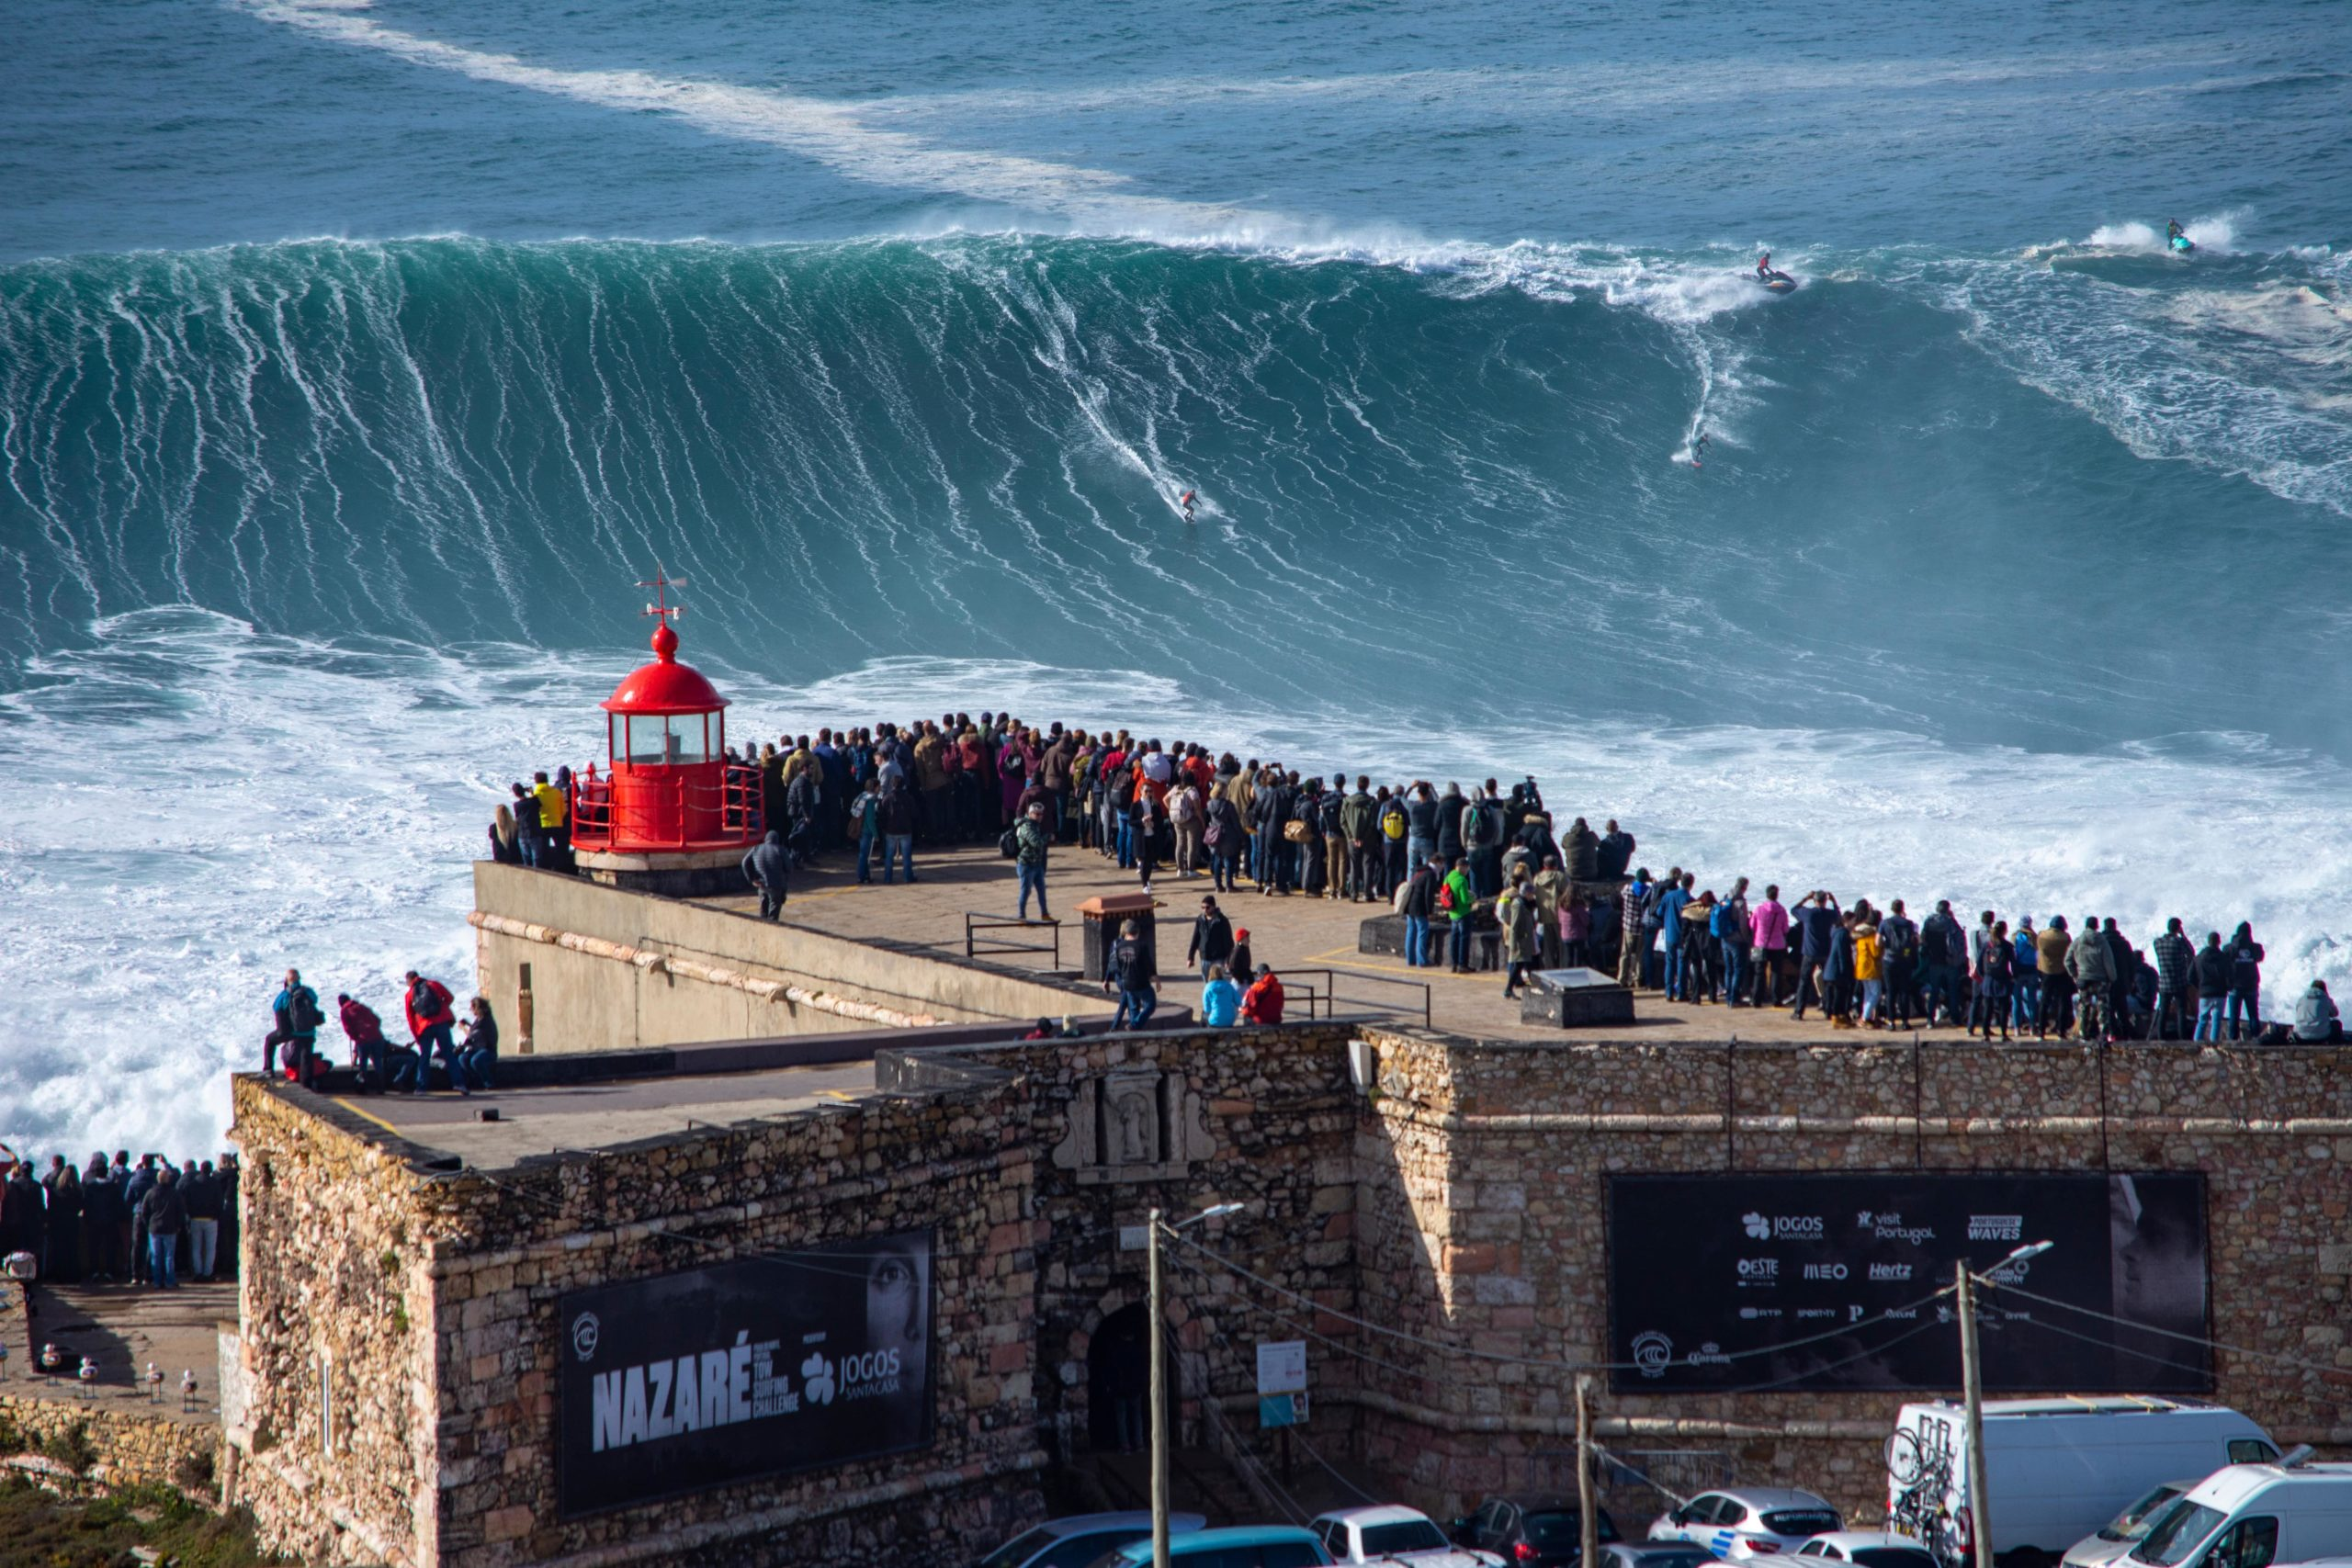 Surfing Portugal Nazare